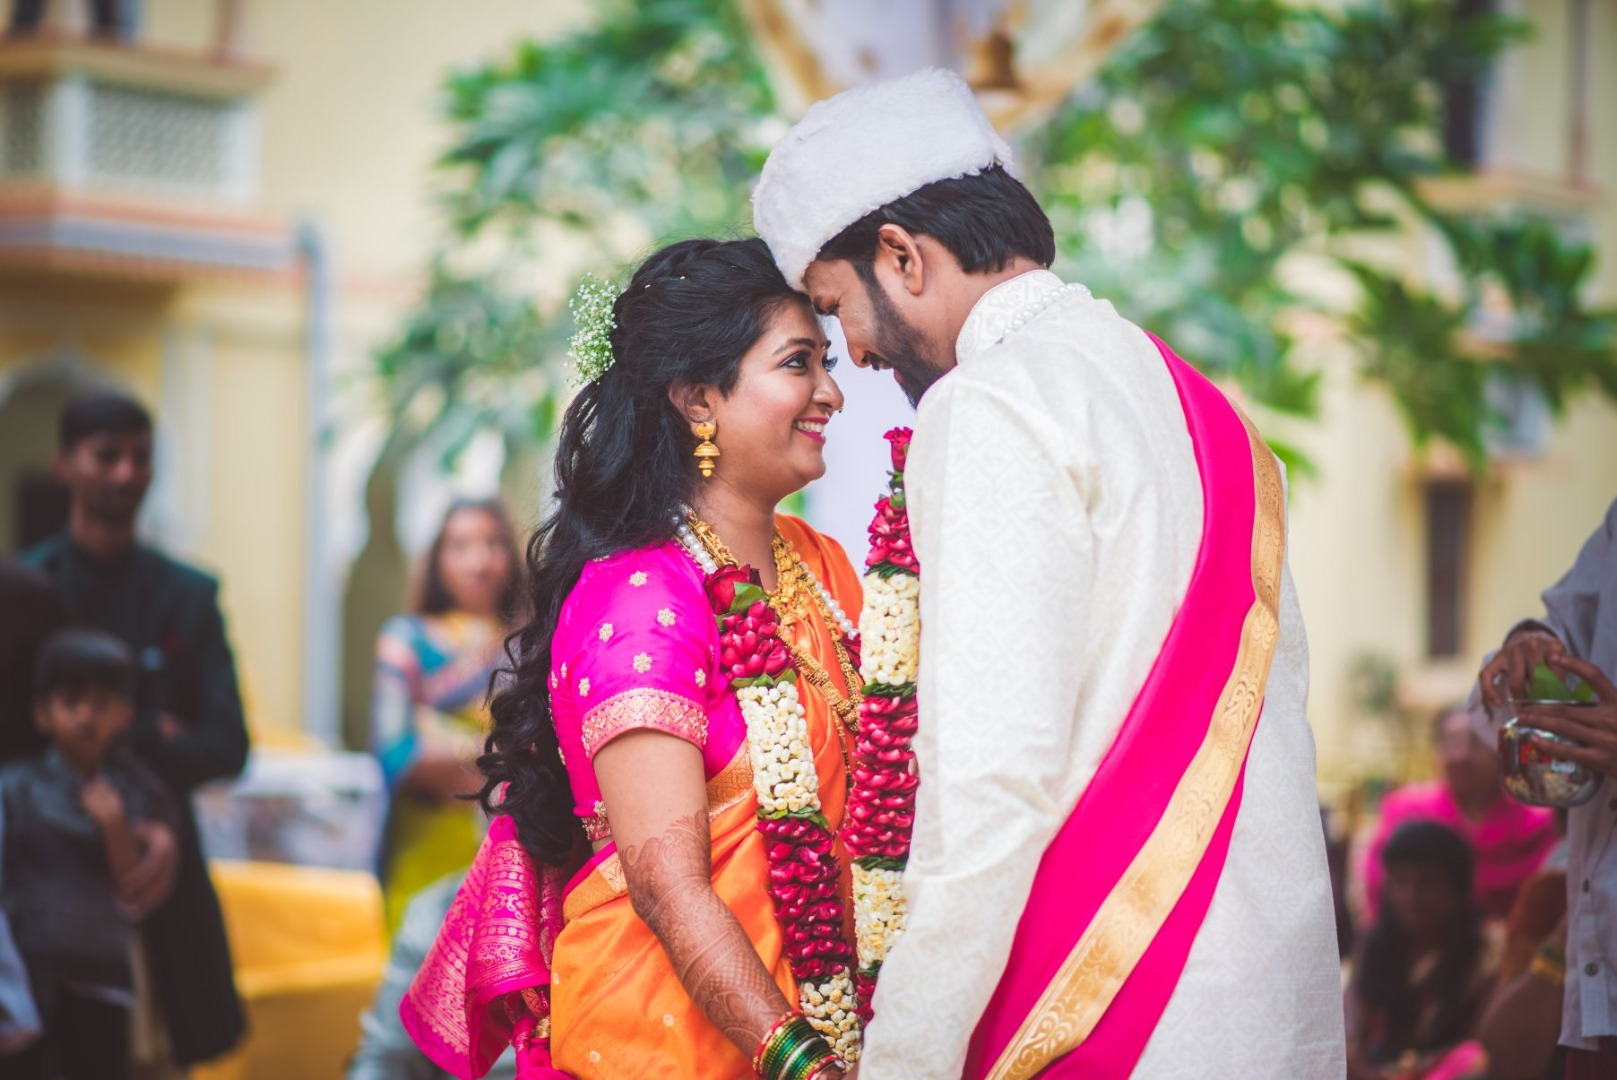 Maharashtrian Bride & Groom Candid Shot Post Wedding Picture